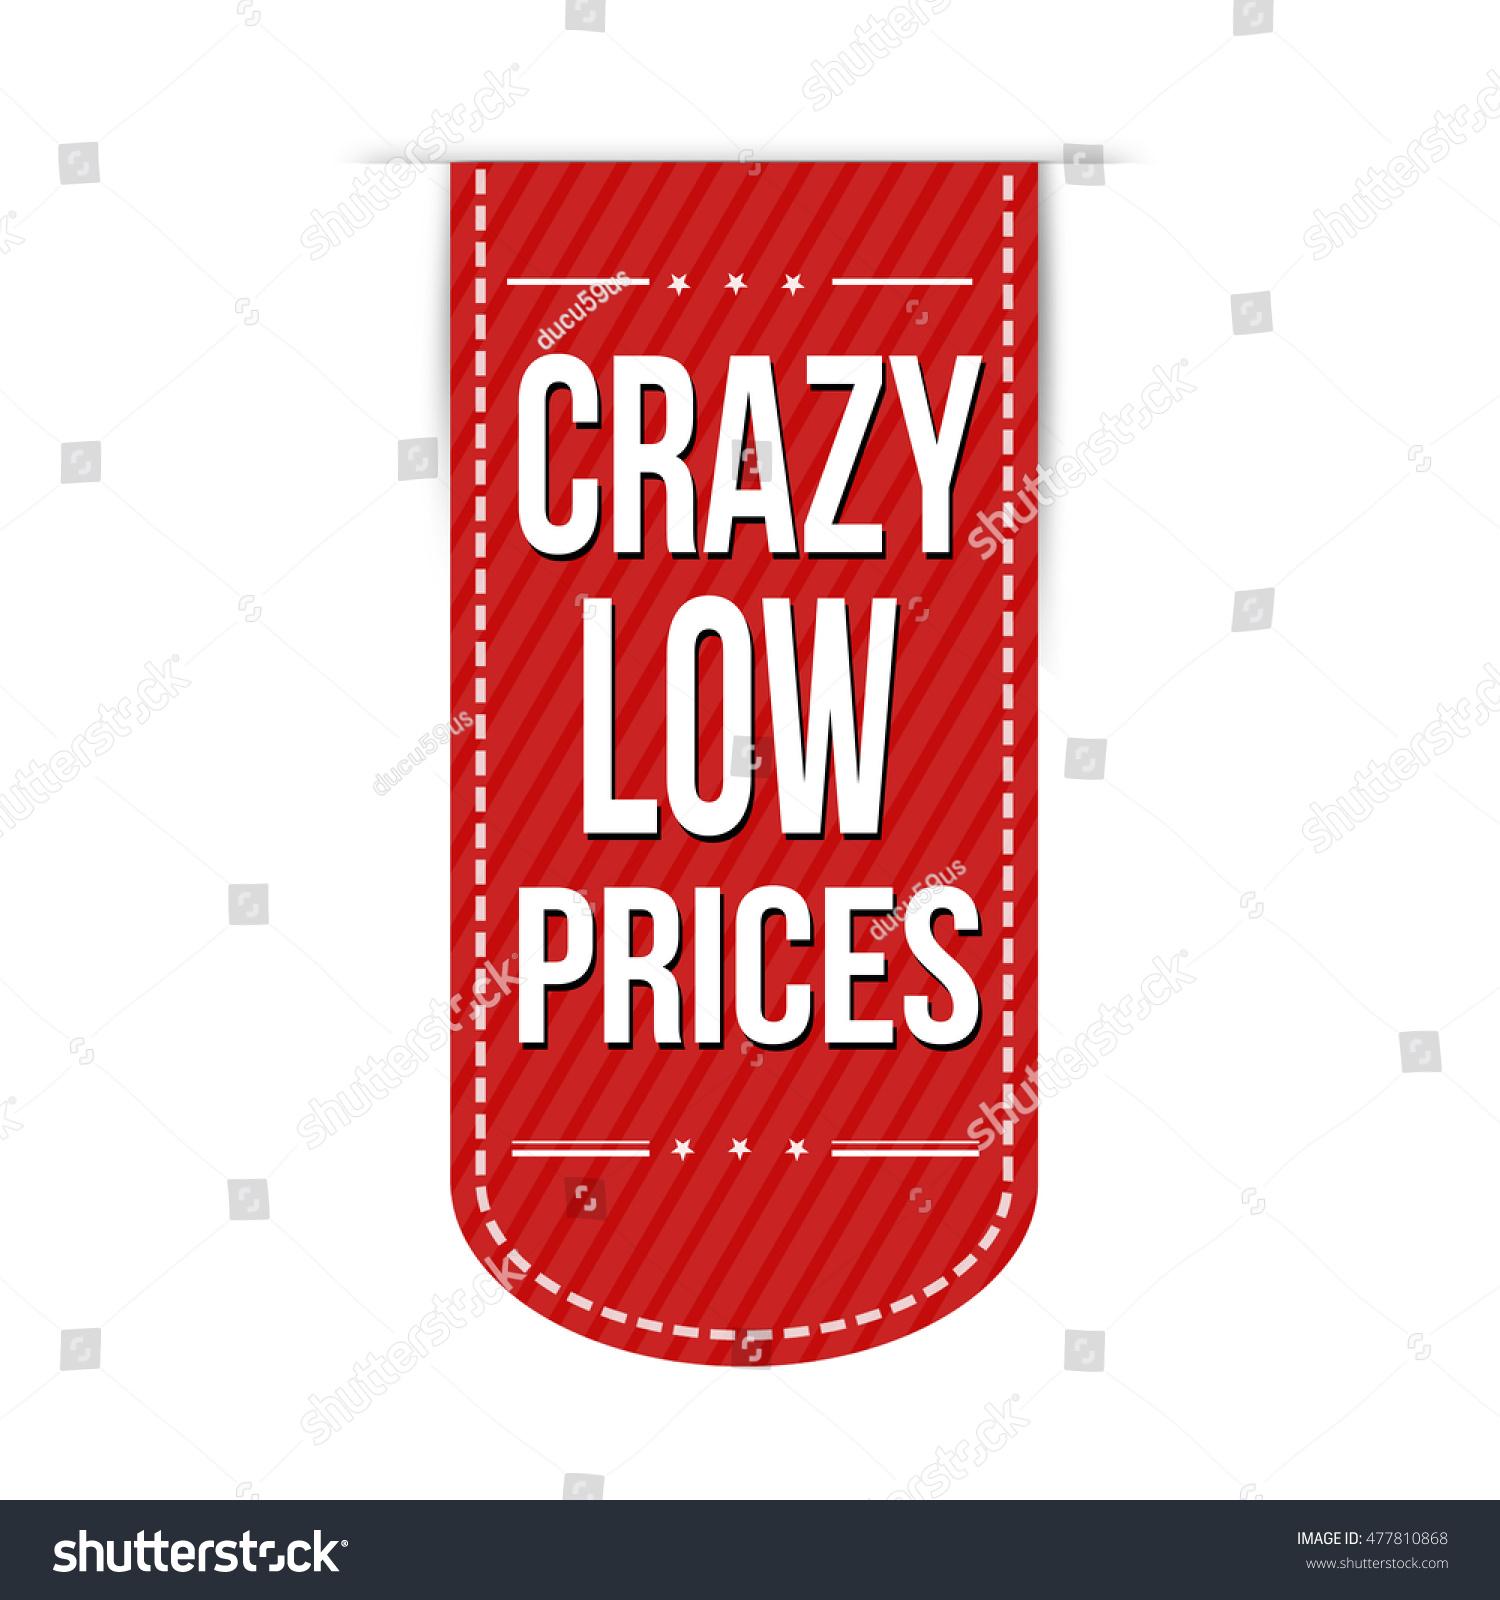 crazy low prices banner design over stock vector 477810868 shutterstock